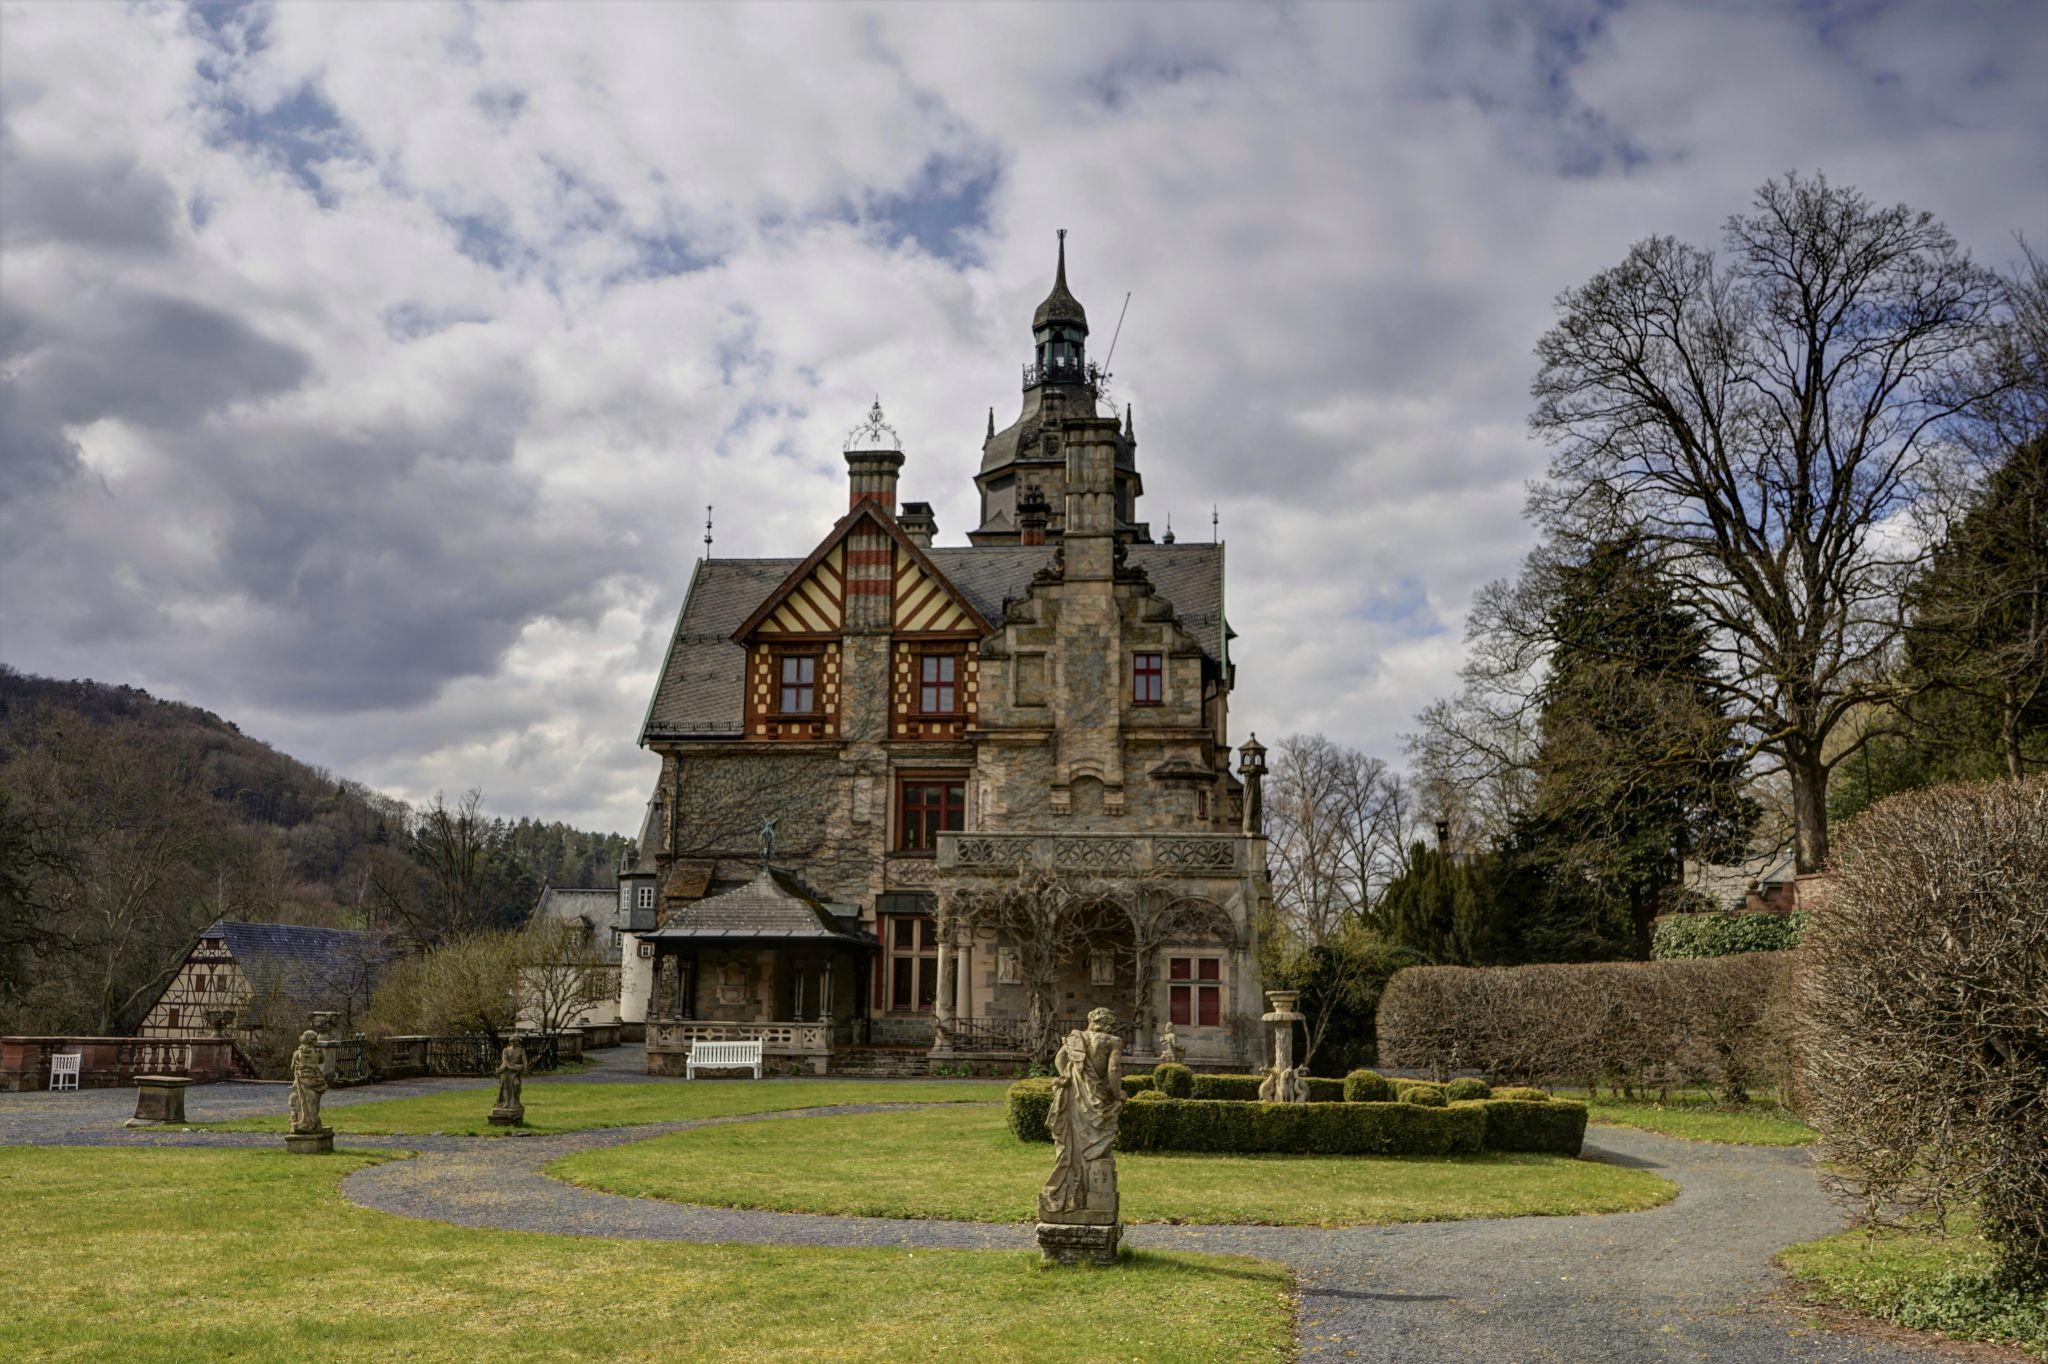 Ramholz Castle, Germany